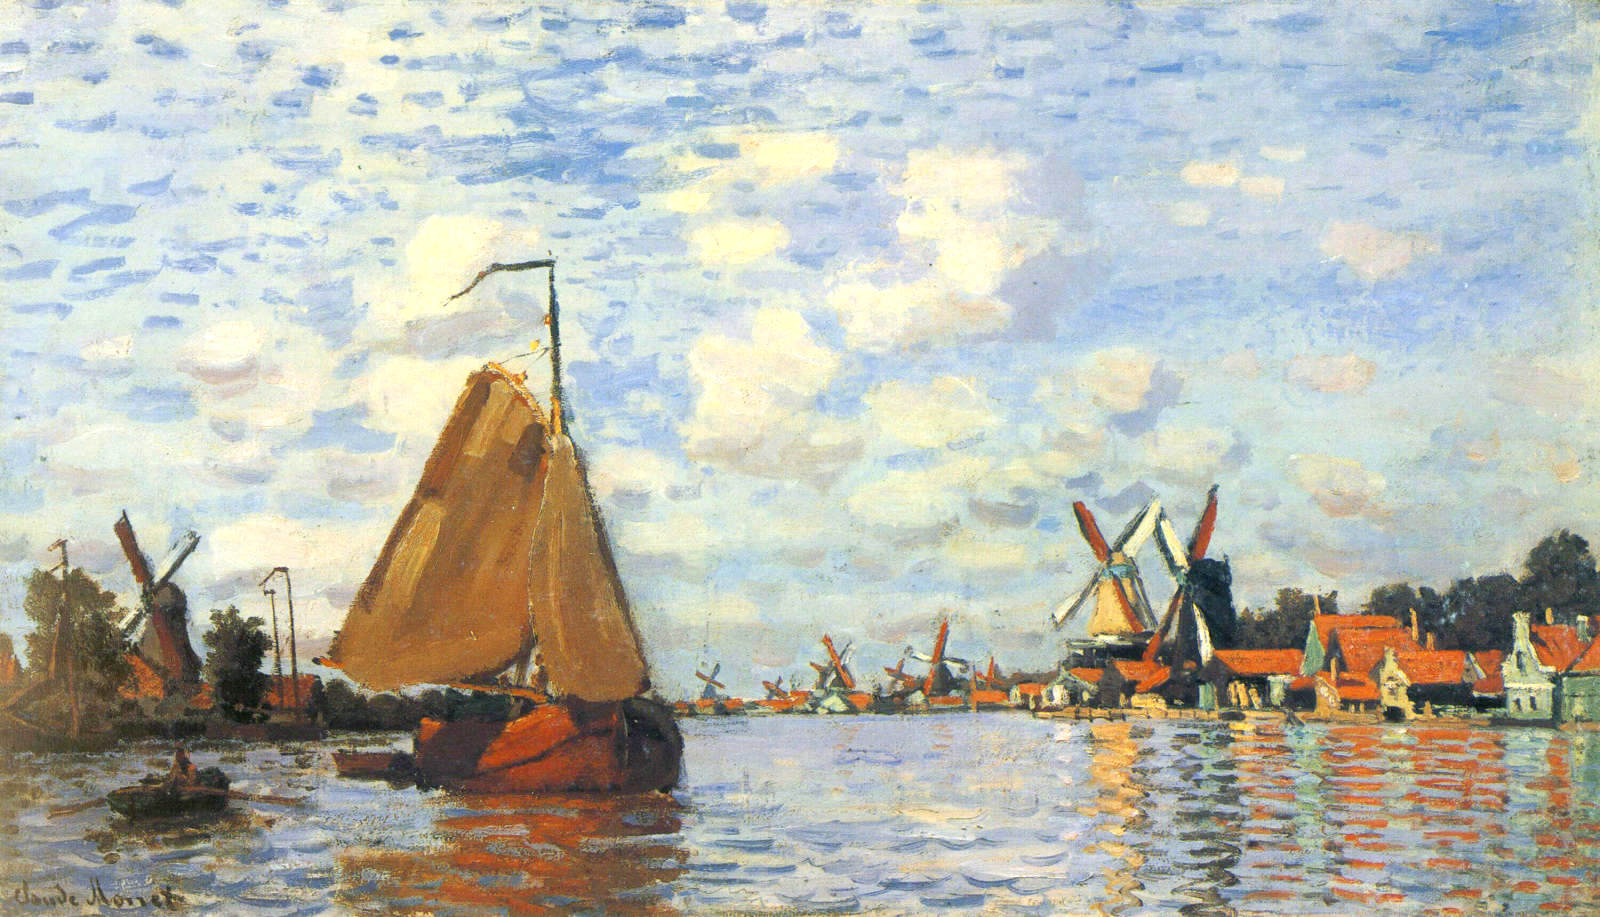 File:Monet - Die Zaan bei Zaandam.jpg - Wikimedia Commons